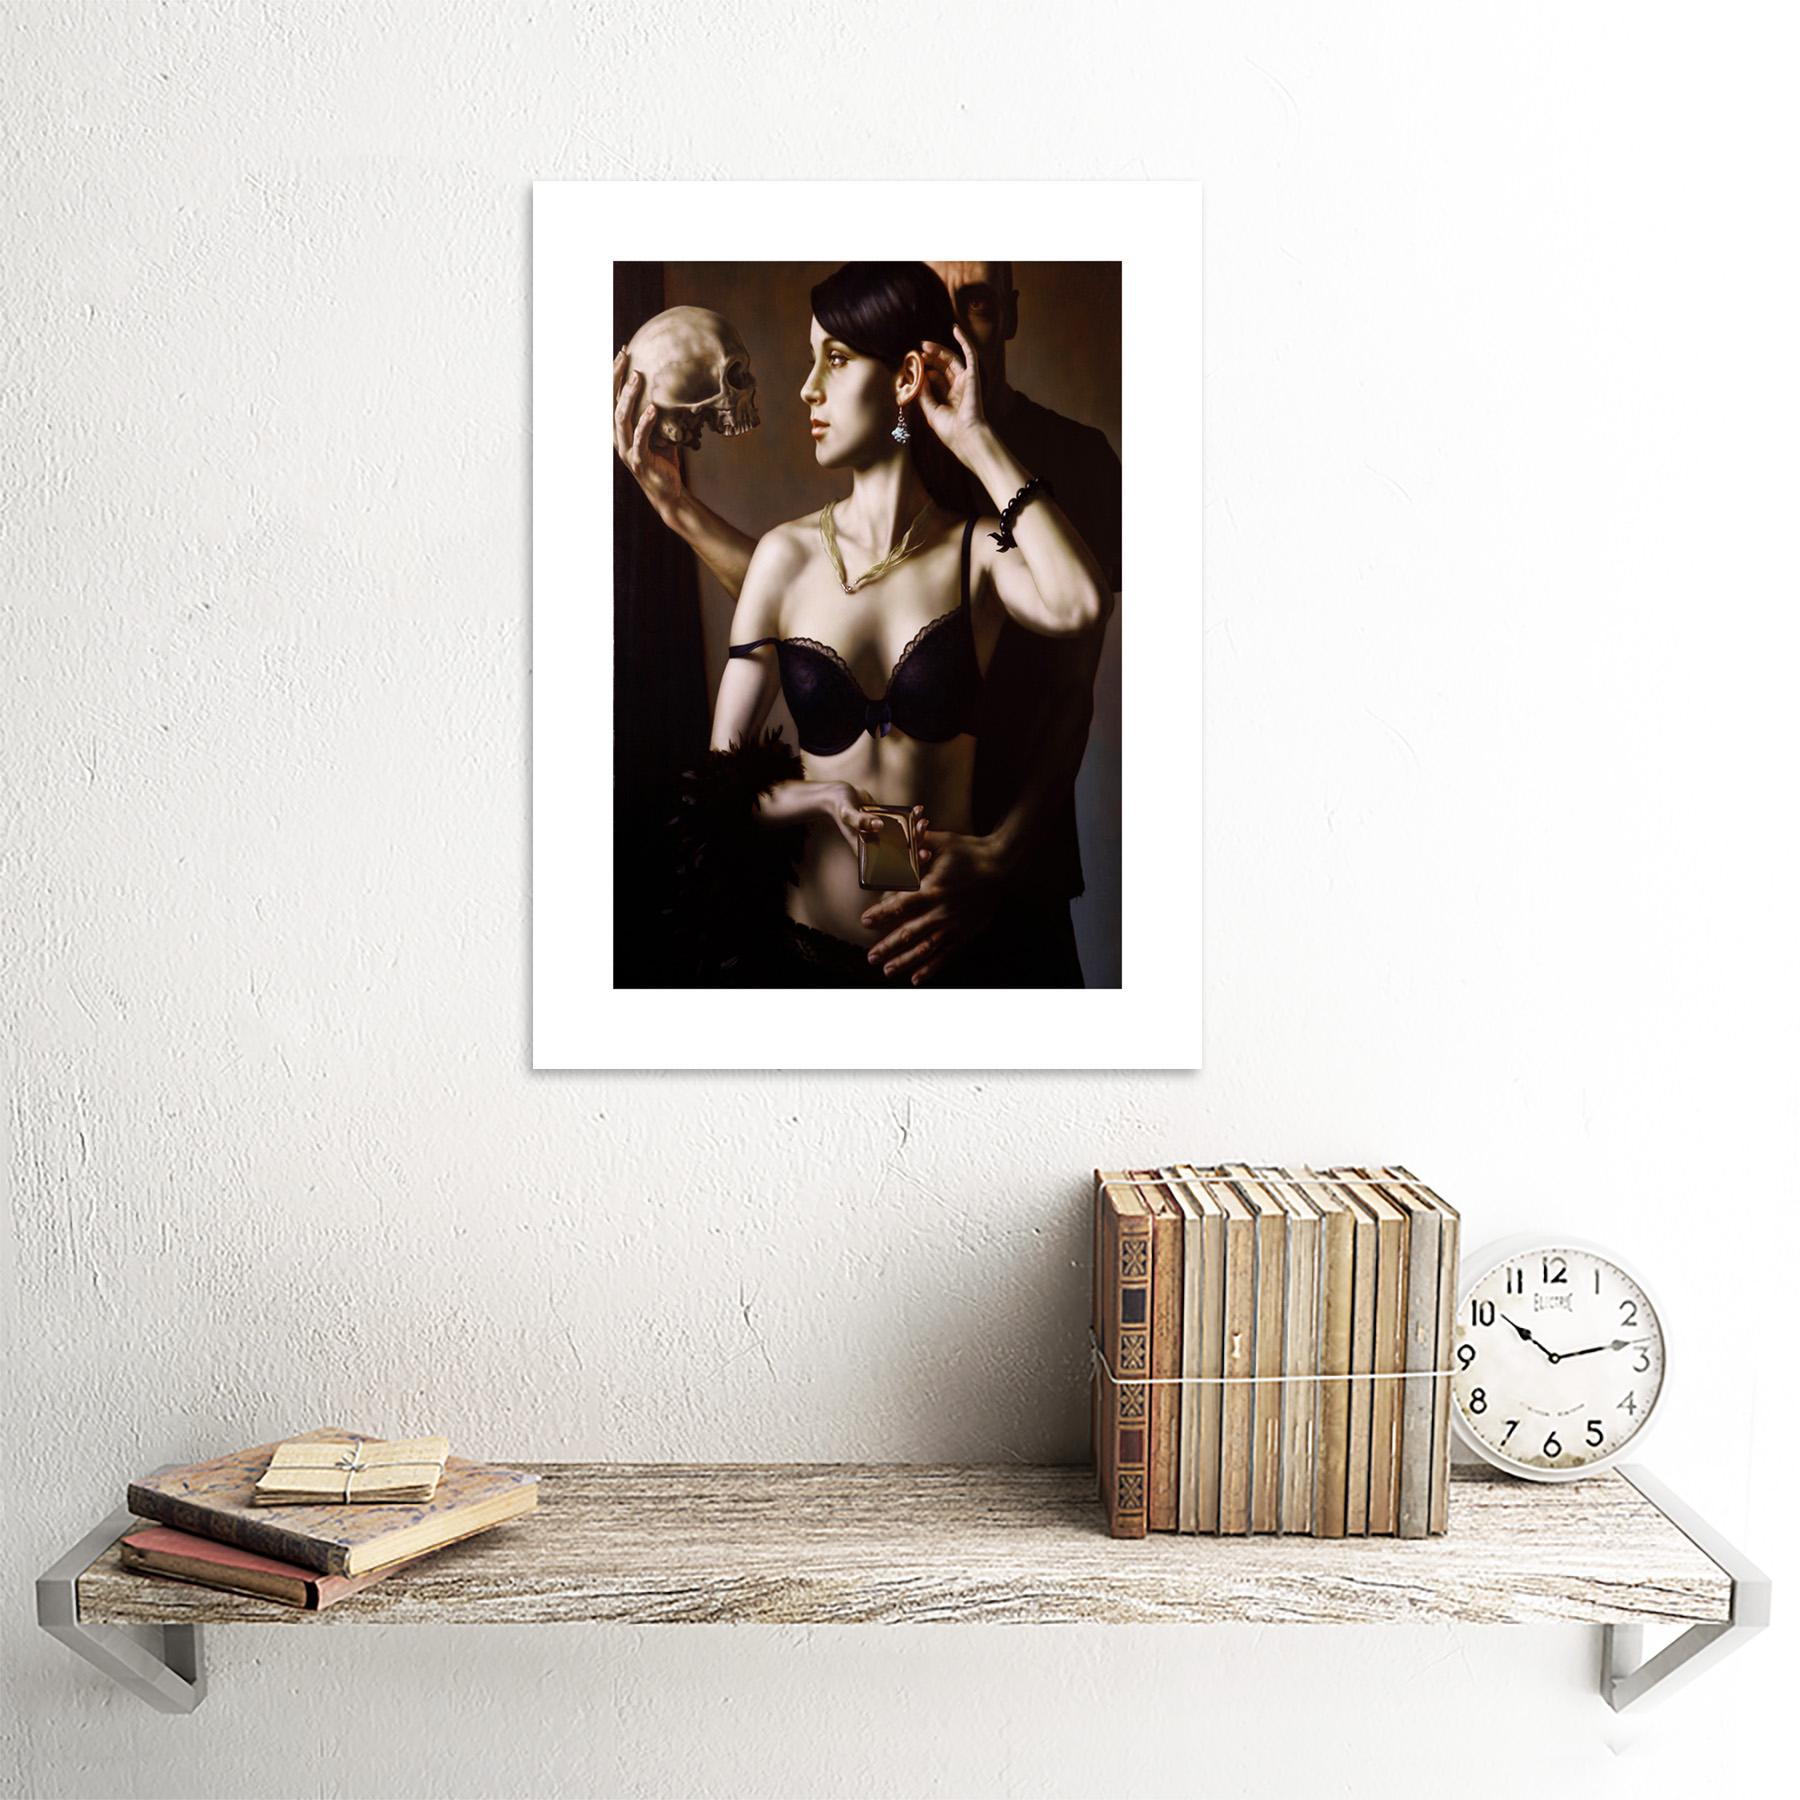 Painting-Balcar-Send-Me-To-The-Future-Framed-Art-Print-12x16-Inch 縮圖 18